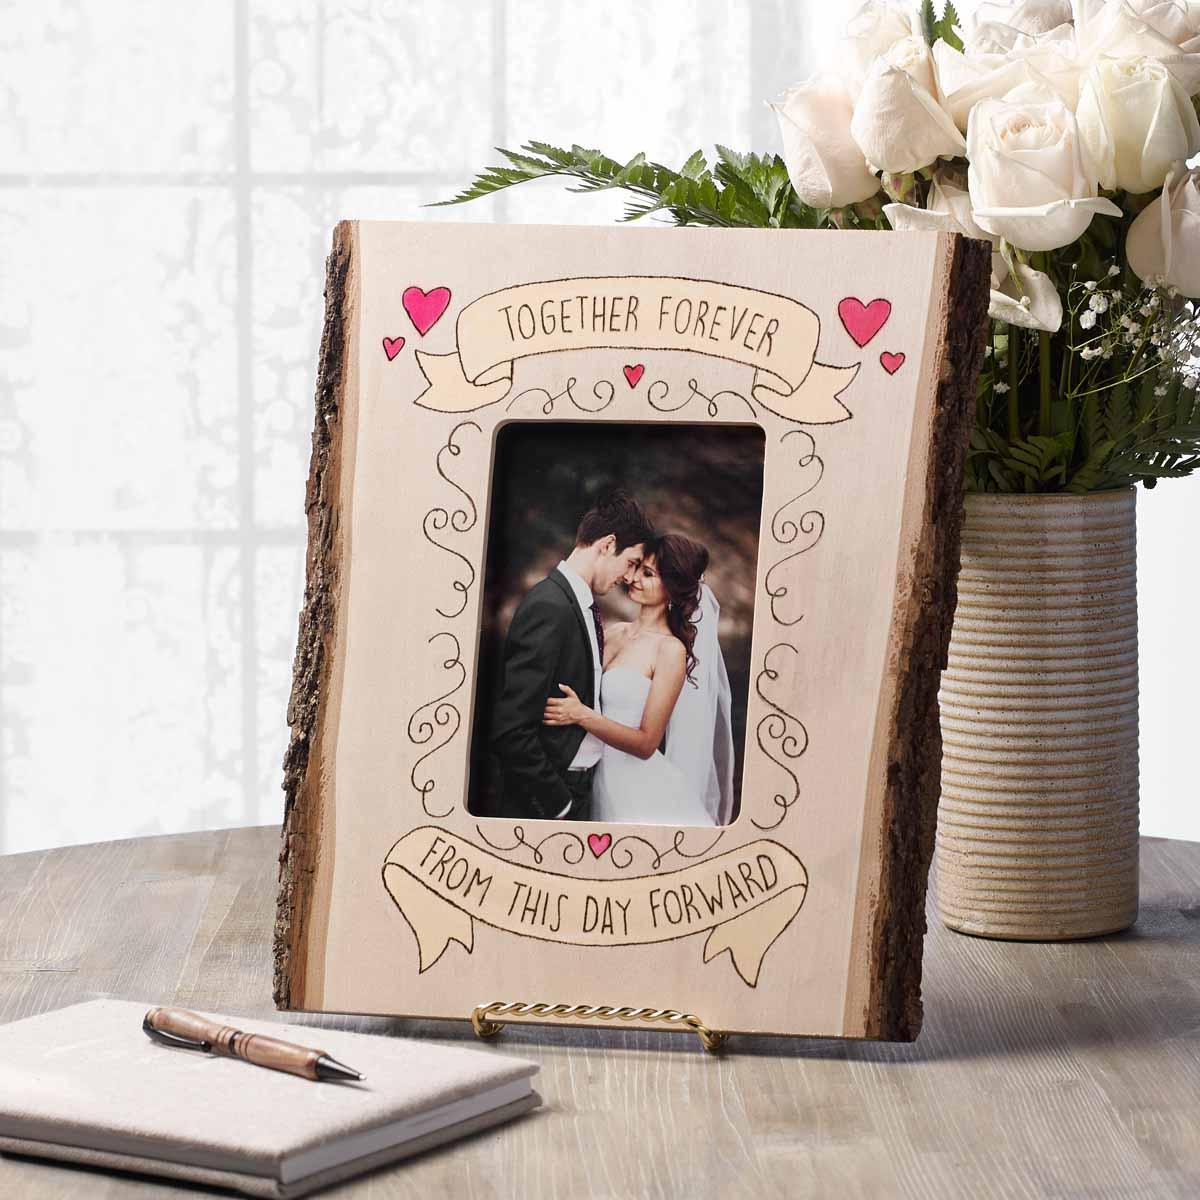 DIY Wood-Burned Wedding Frame